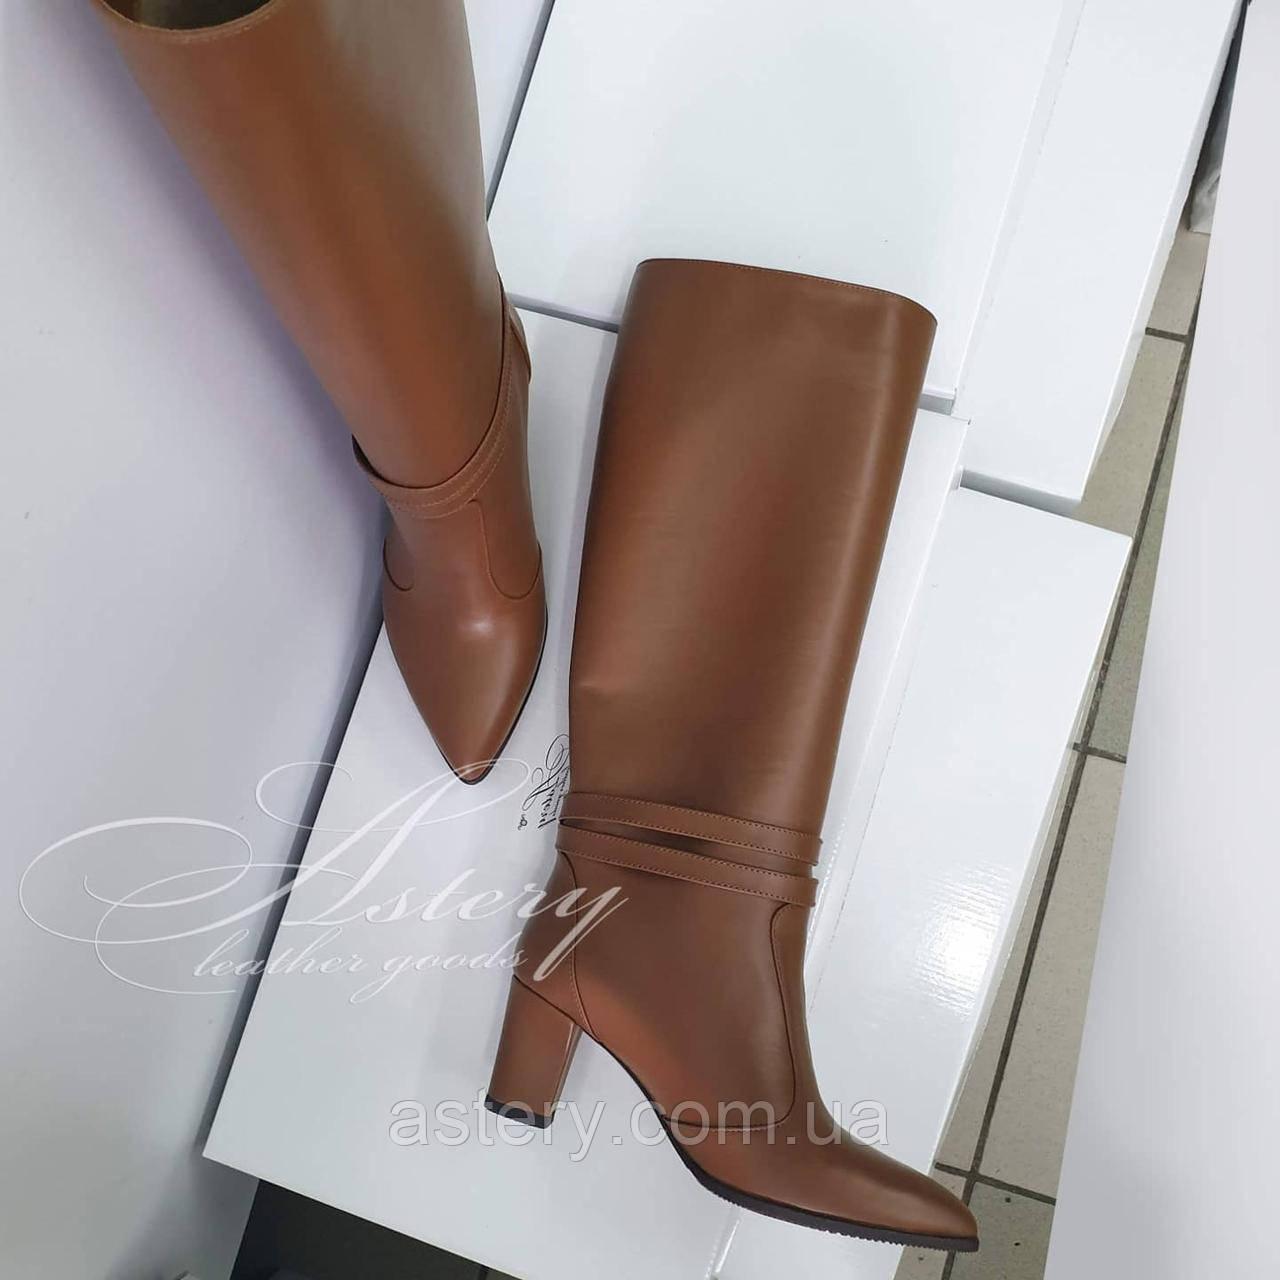 Женские сапоги трубы на каблуке 6см